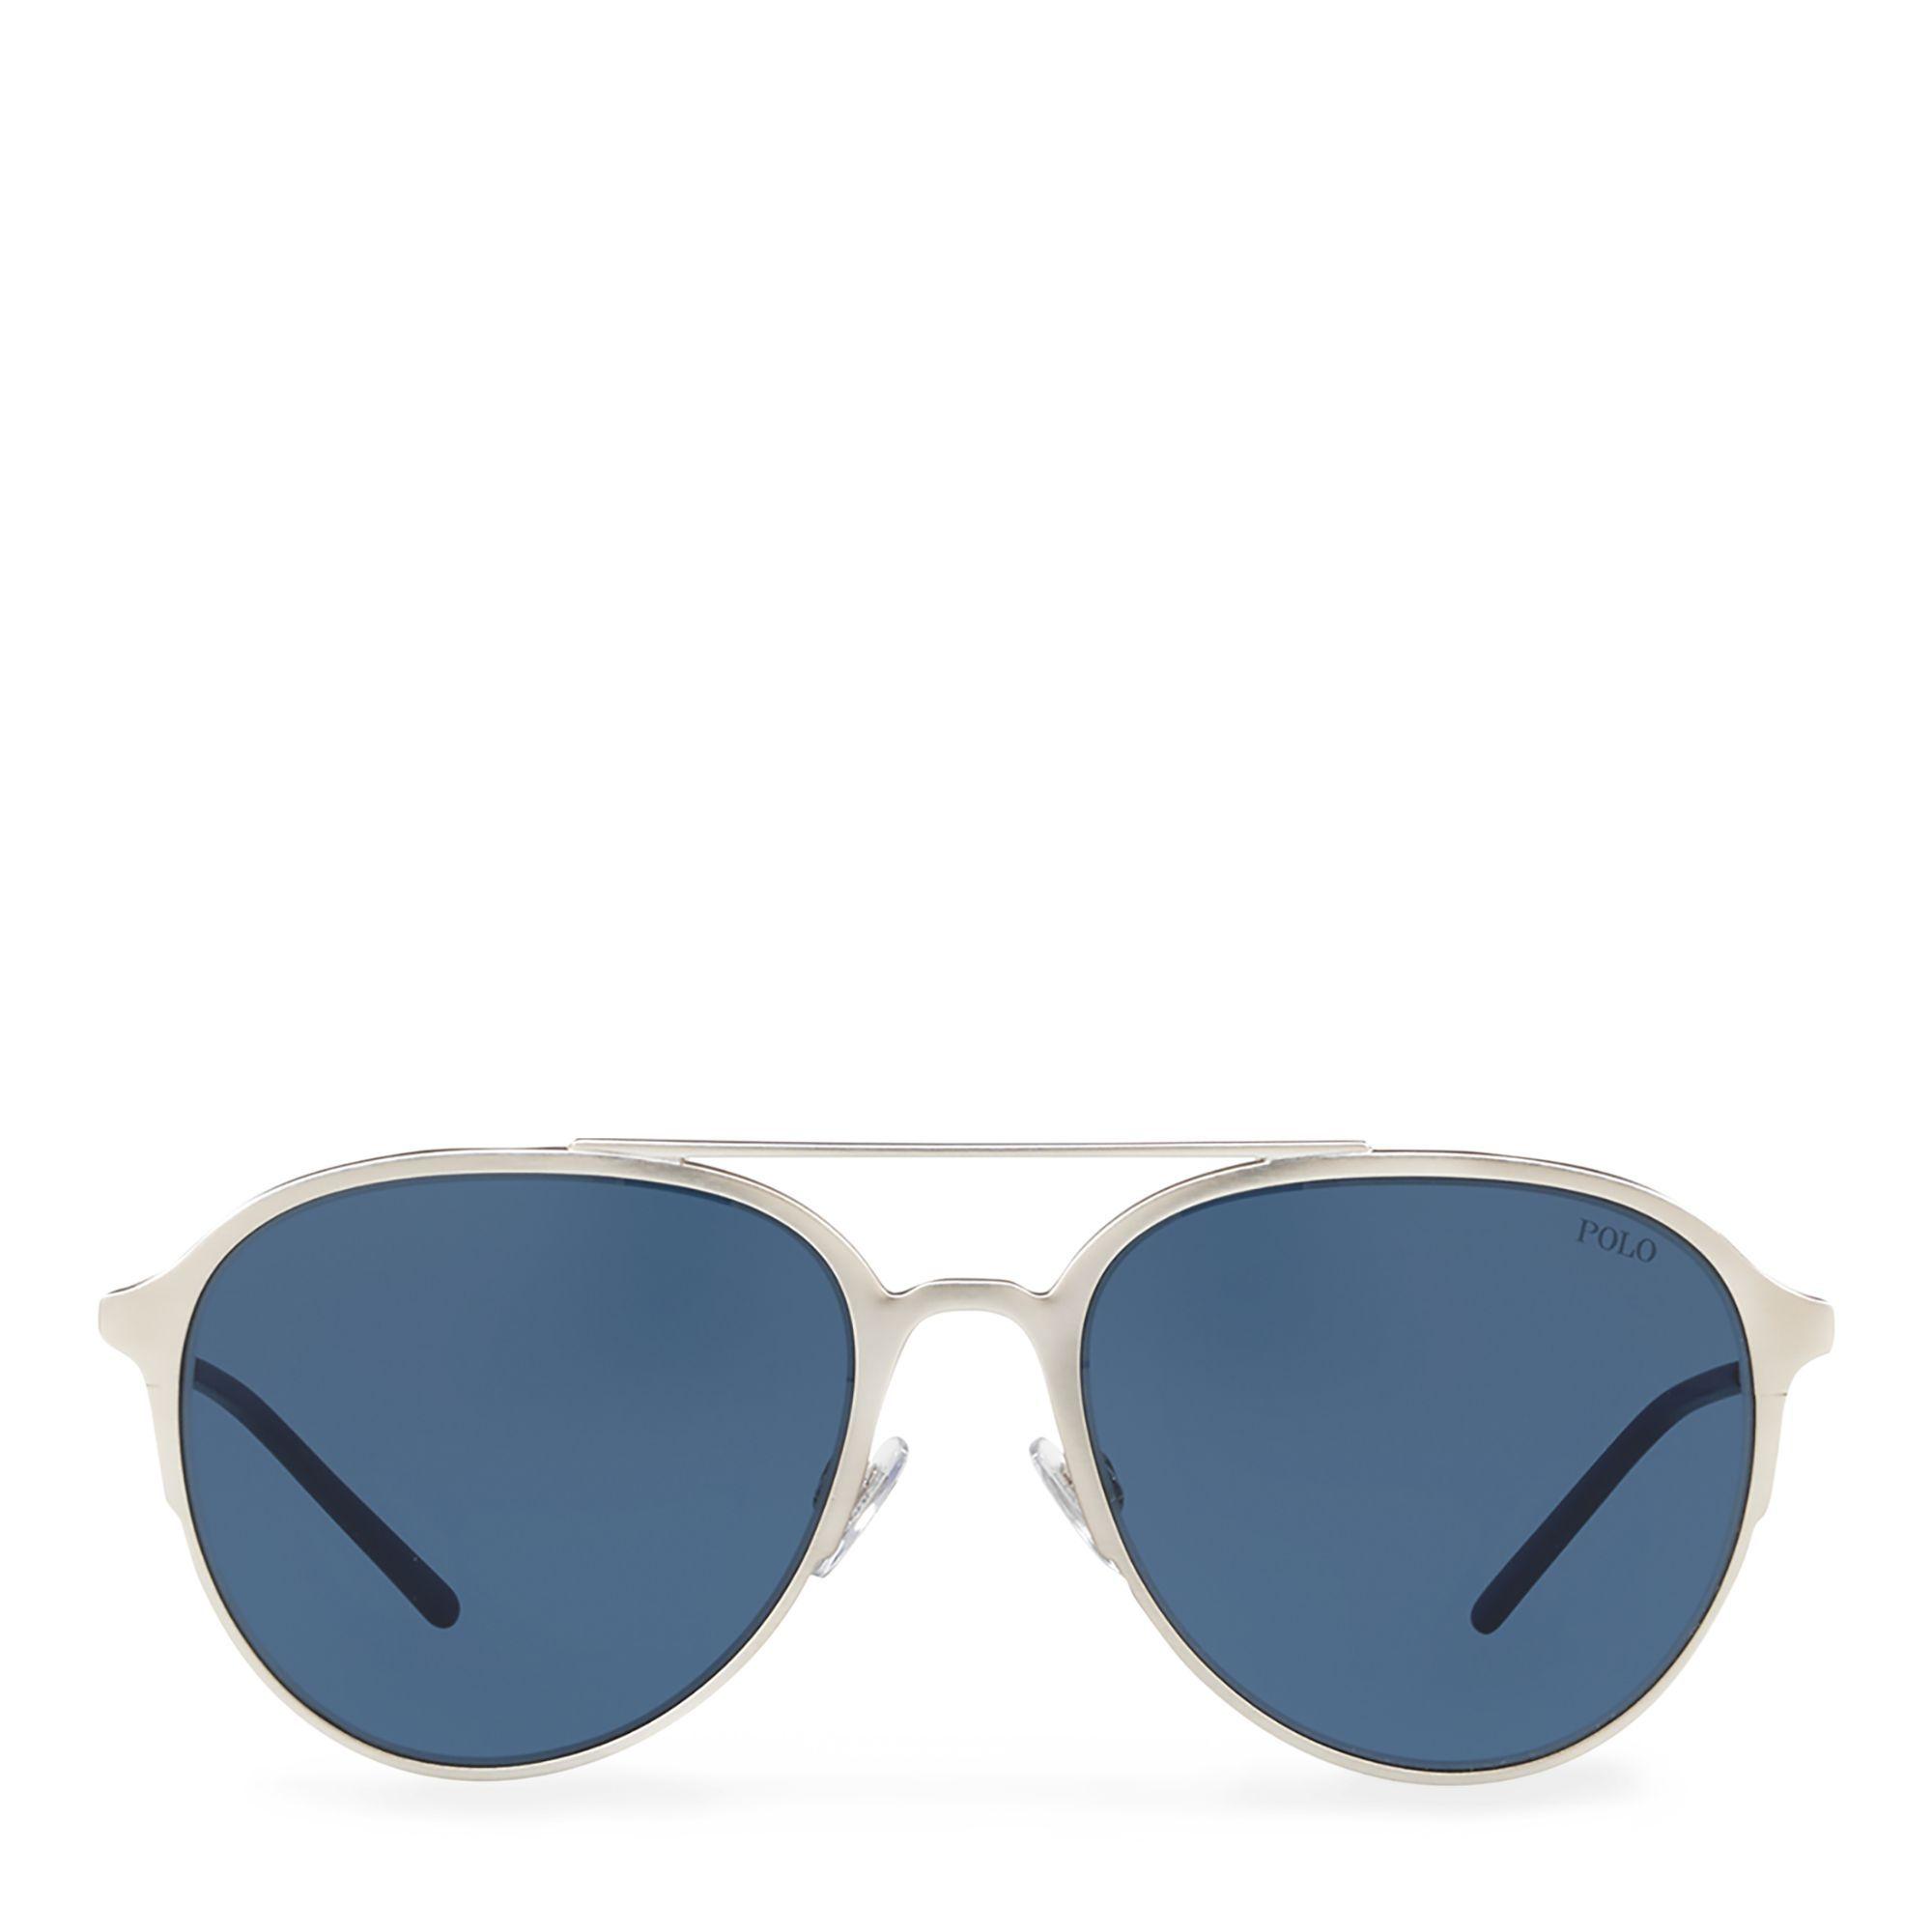 f38ebe430 سعر Giorgio Armani Butterfly Women's Sunglasses - AR8047-501711-56 ...